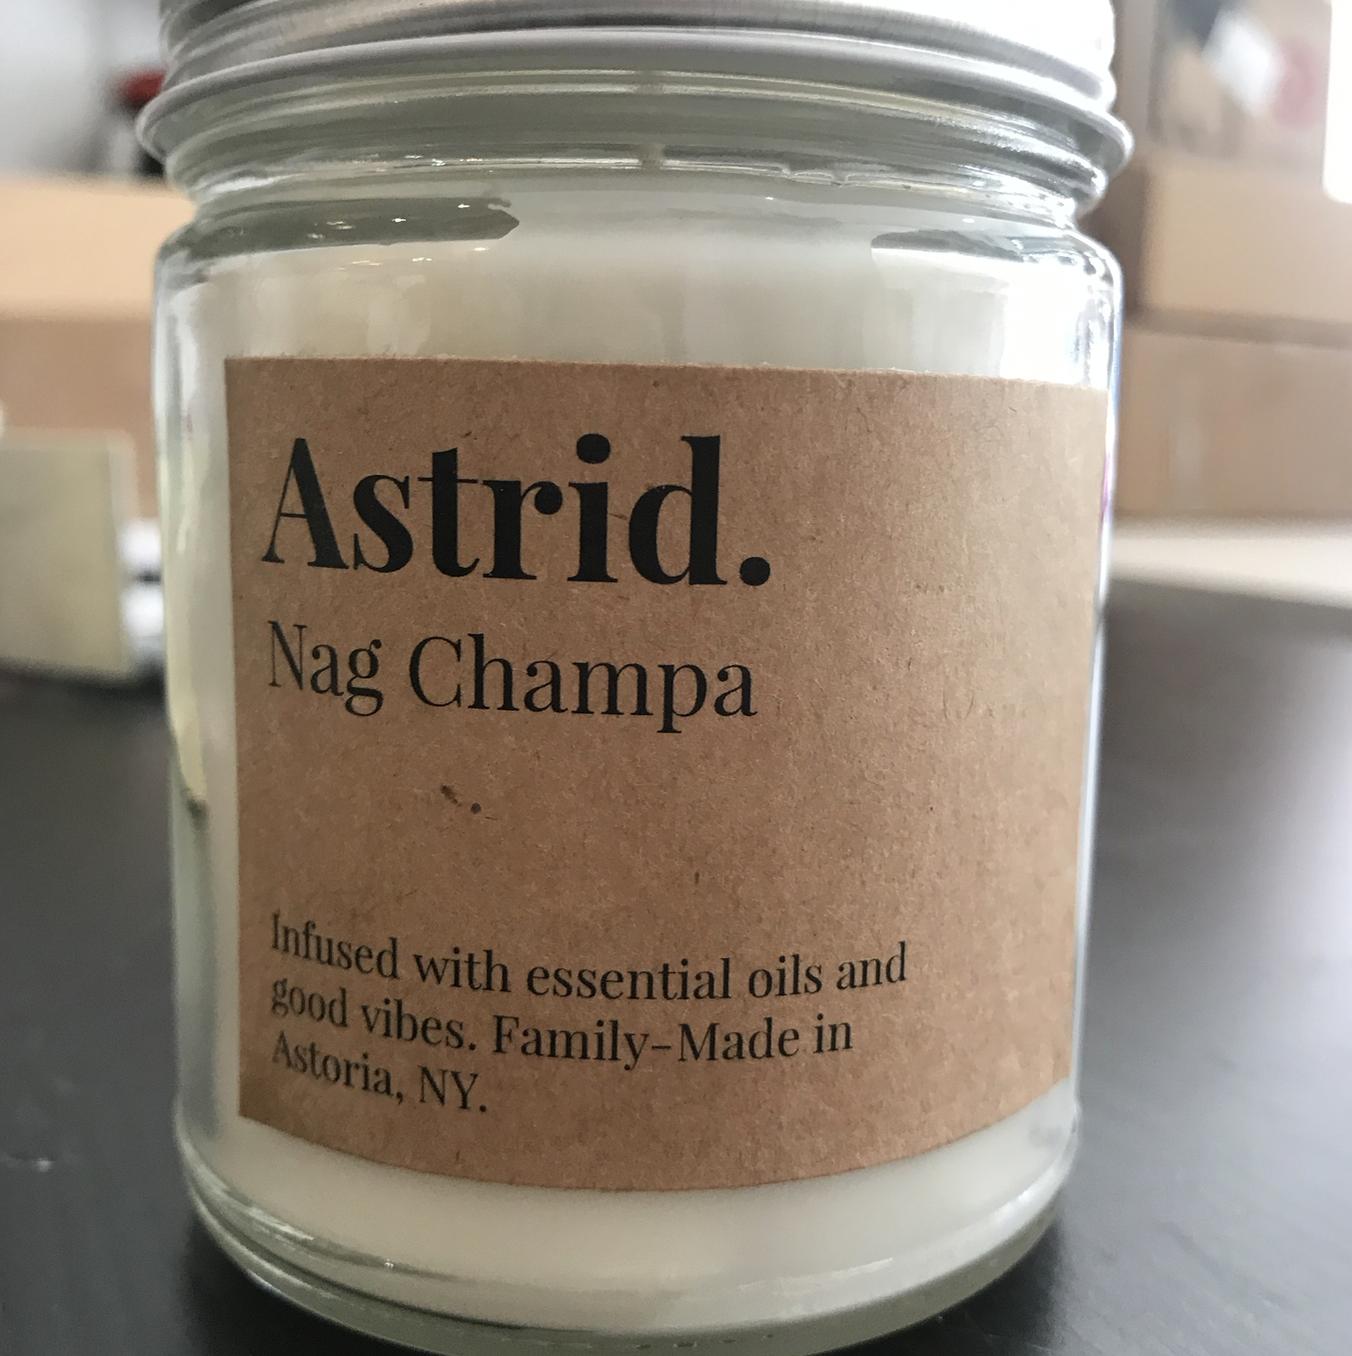 Astrid Paper & Home Astrid Nag Champa Candle